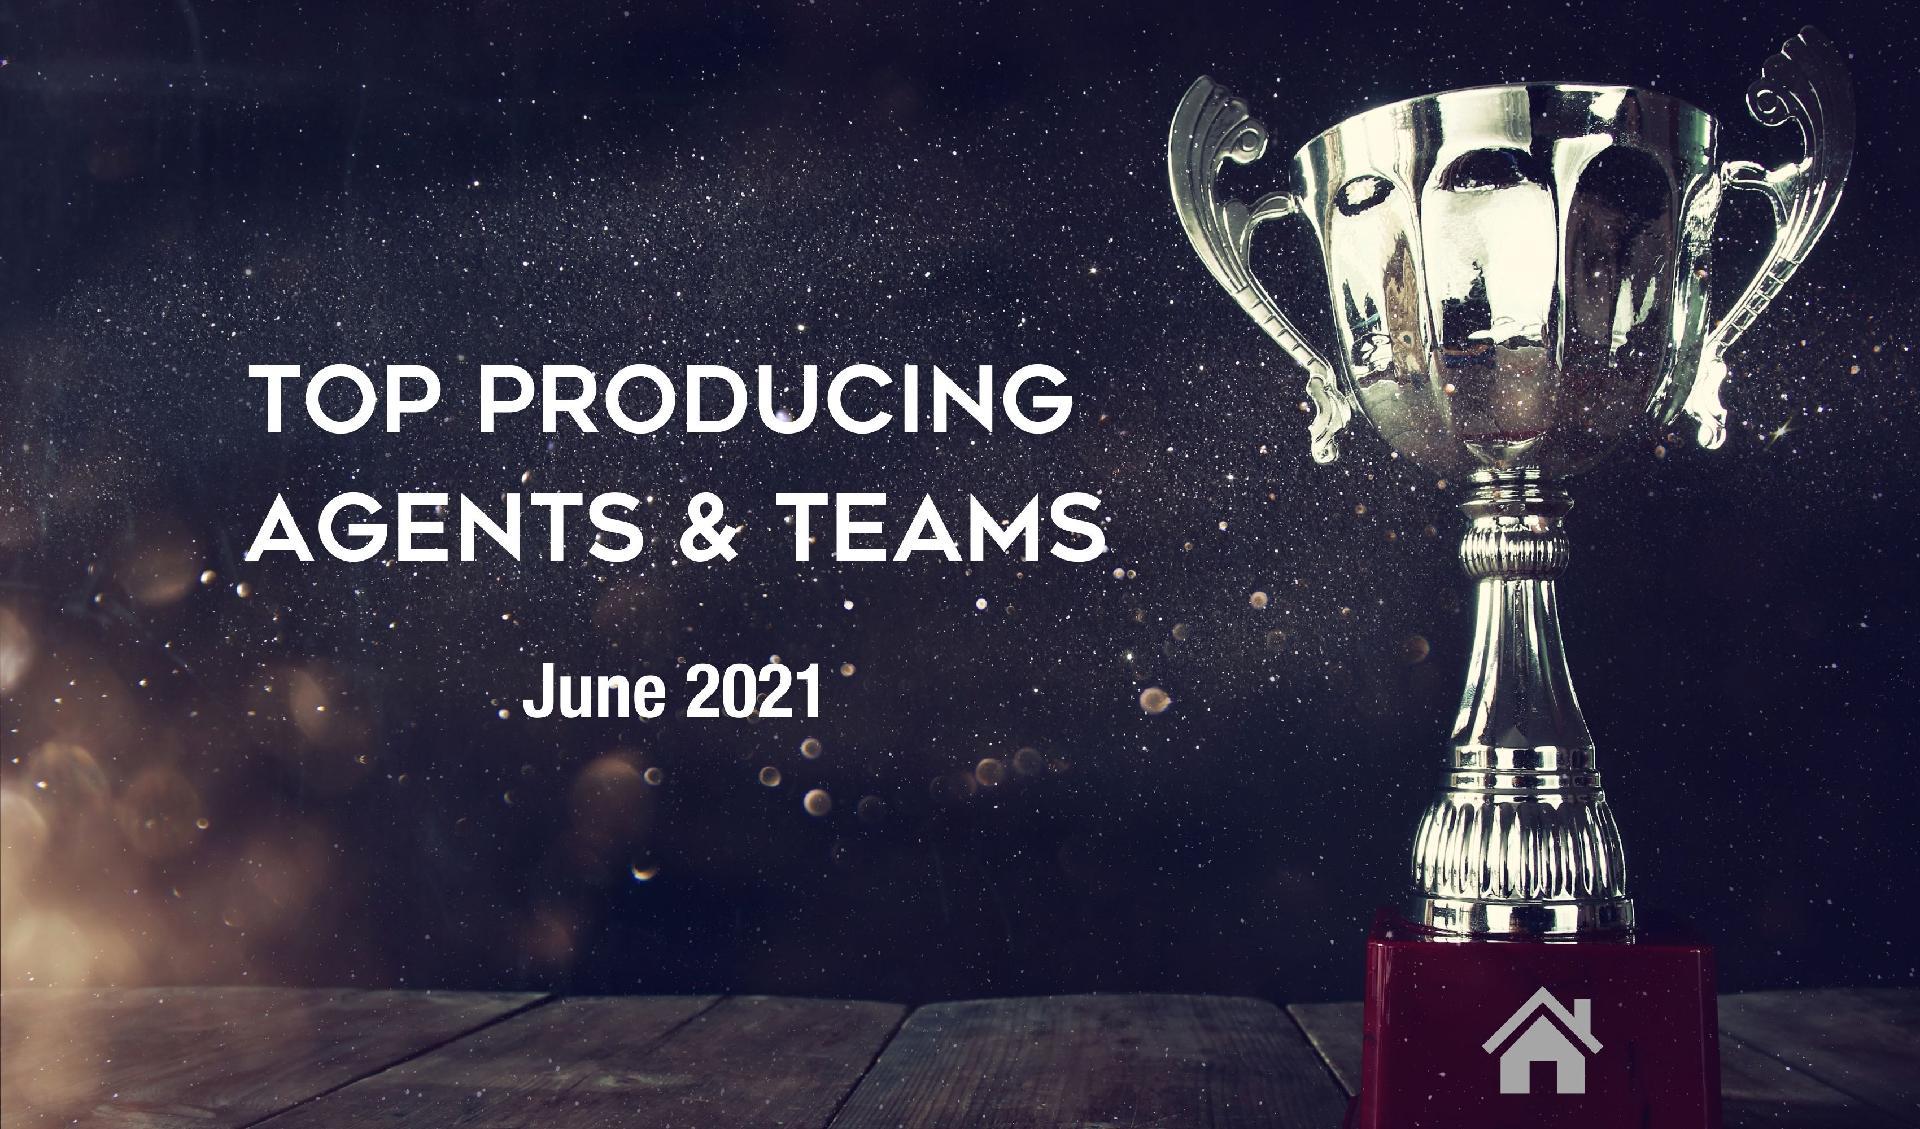 CONGRATULATIONS Top Agents & Teams! June 2021 - North Carolina Picture